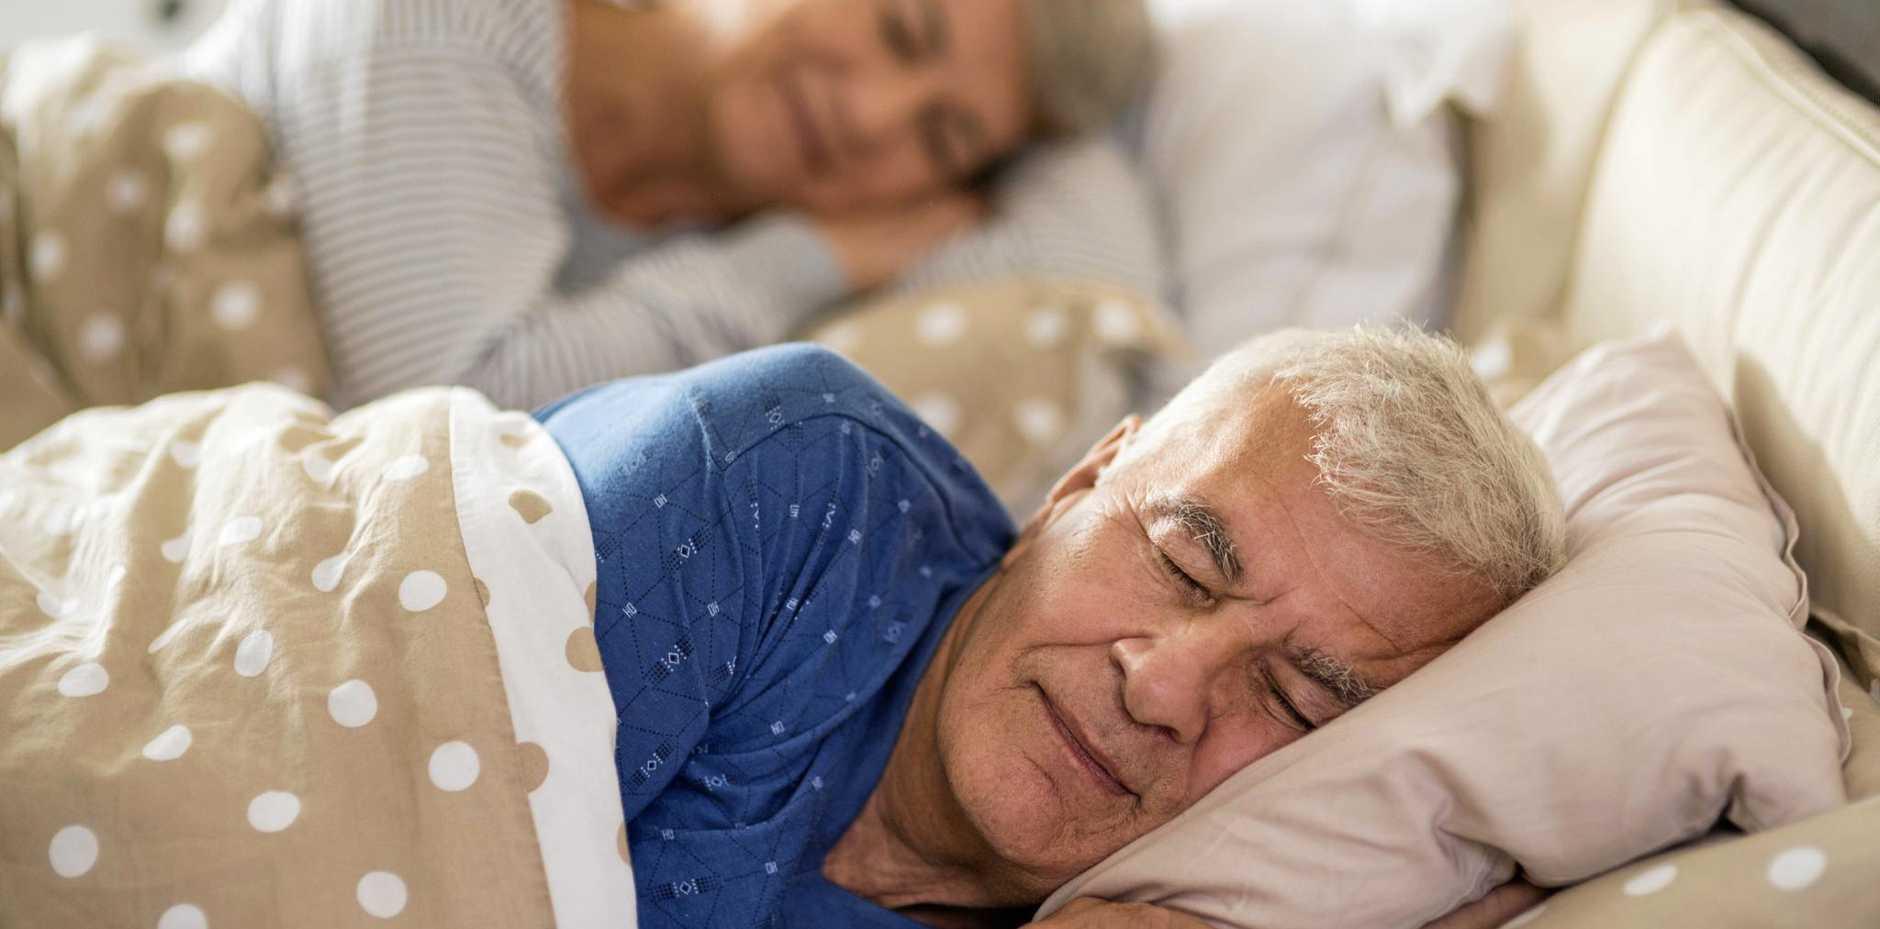 SEEKING SLEEP: Learn how to sleep just a little better each night.